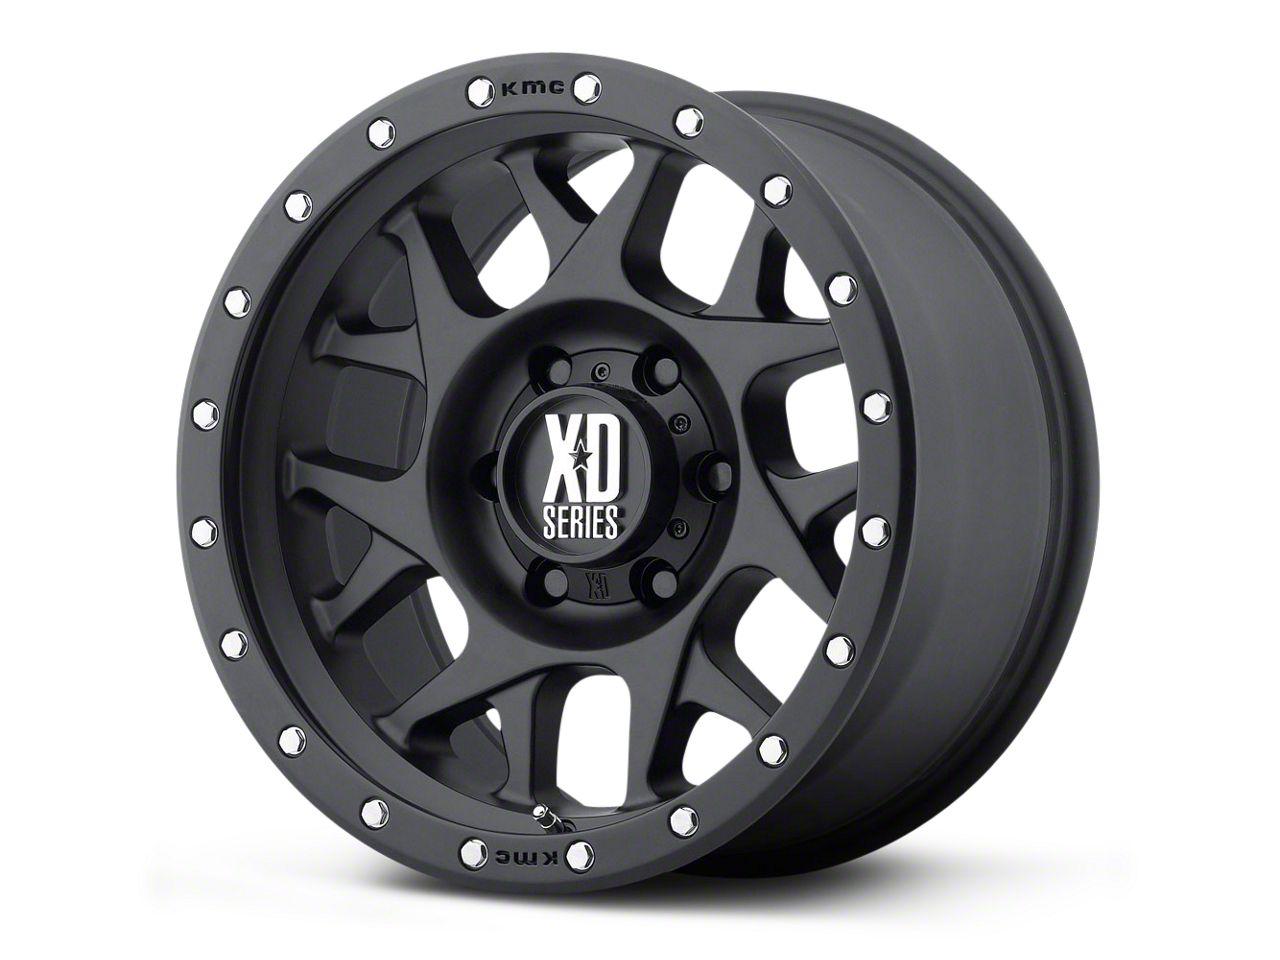 XD Bully Satin Black 5-Lug Wheel - 17x8.5 (02-18 RAM 1500, Excluding Mega Cab)